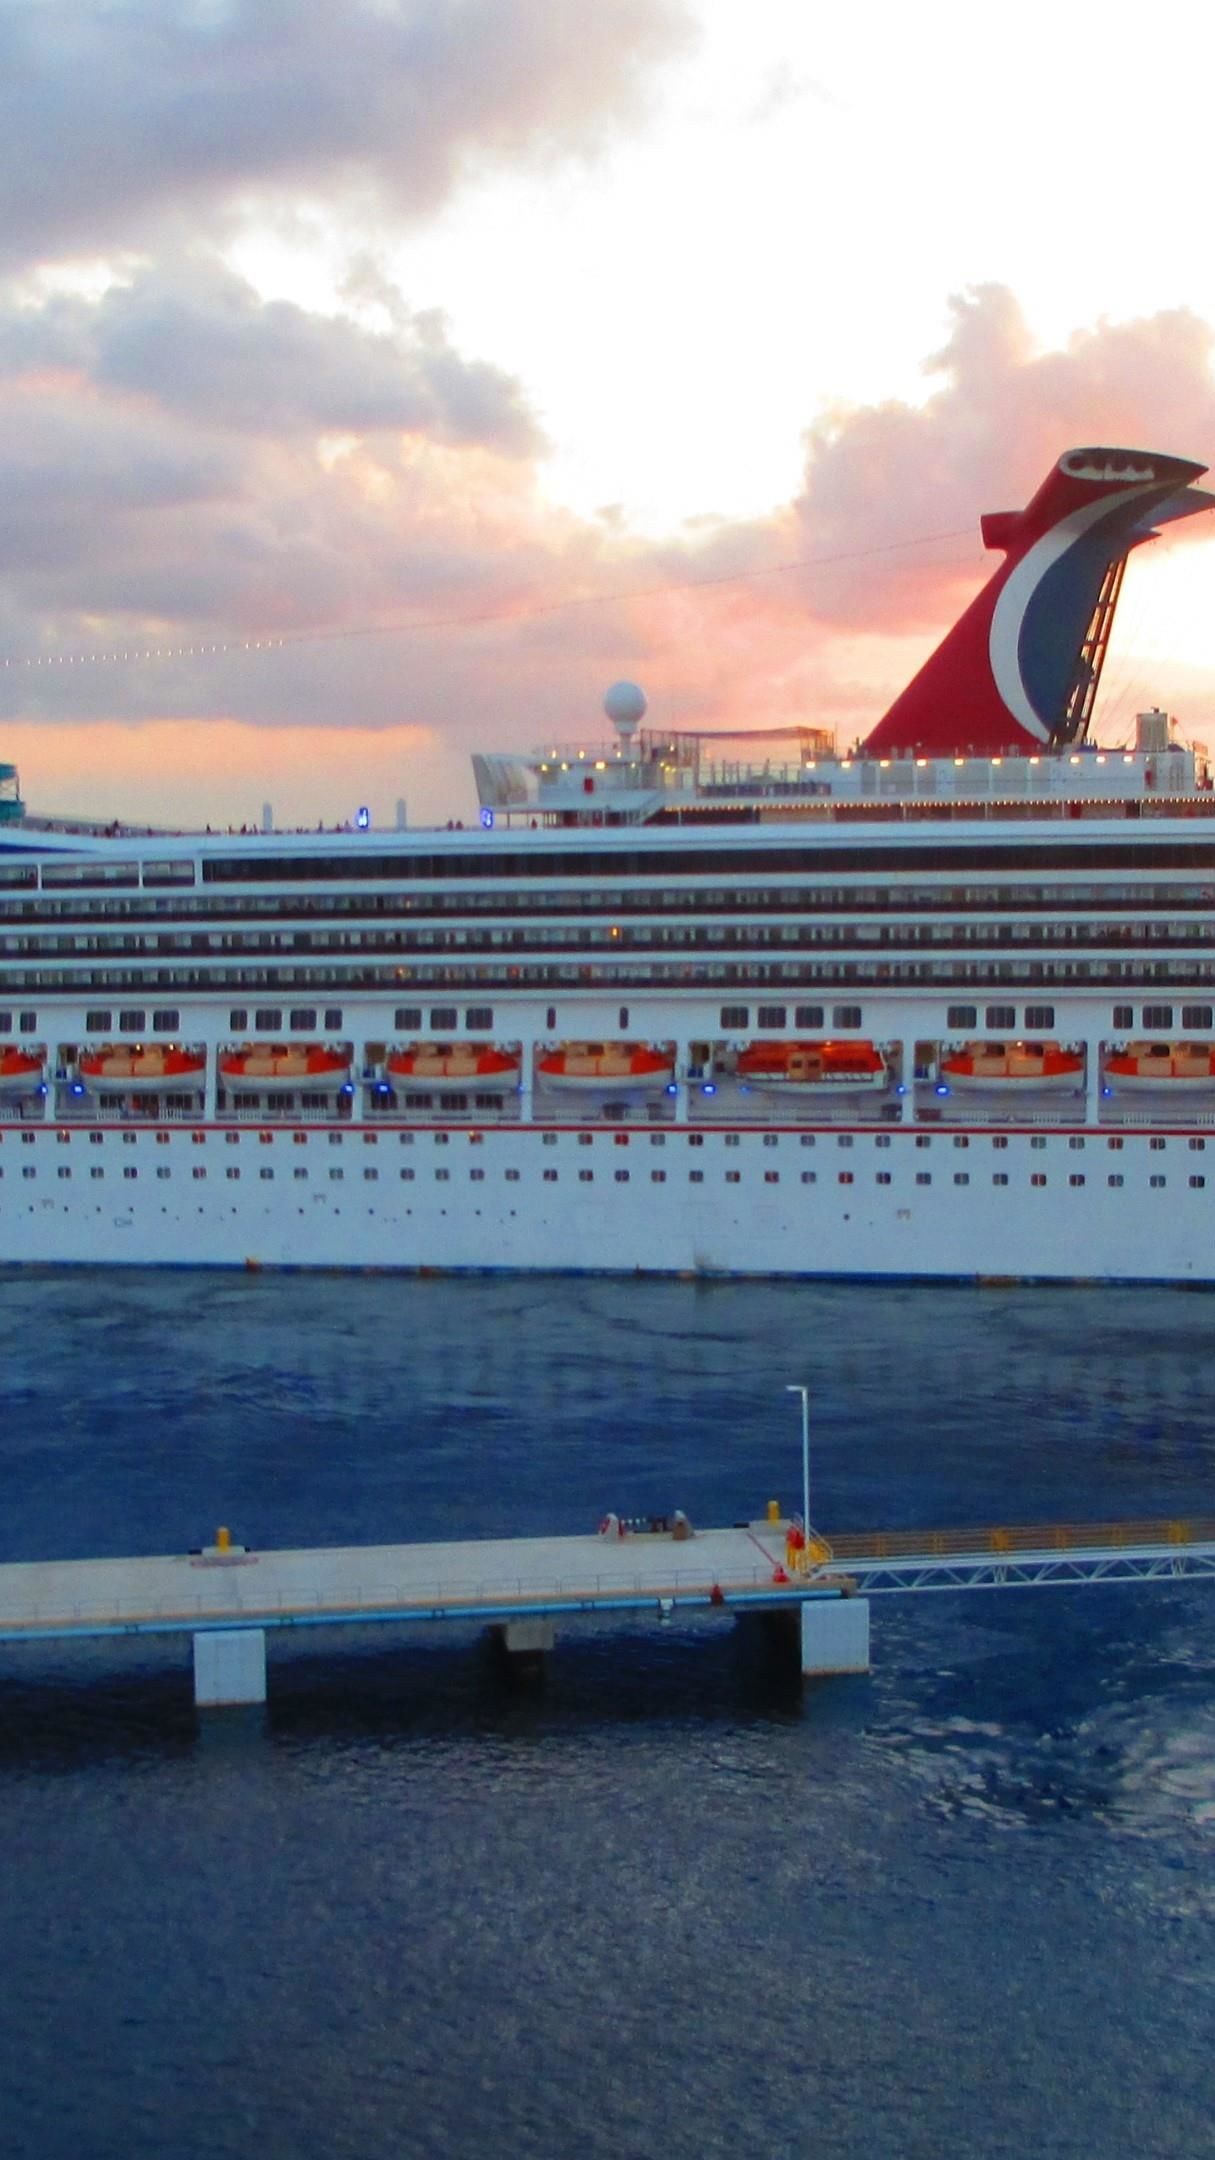 Cruise Ship Hd Wallpapers: Carnival Glory Cruise Ship 4K UltraHD Wallpaper